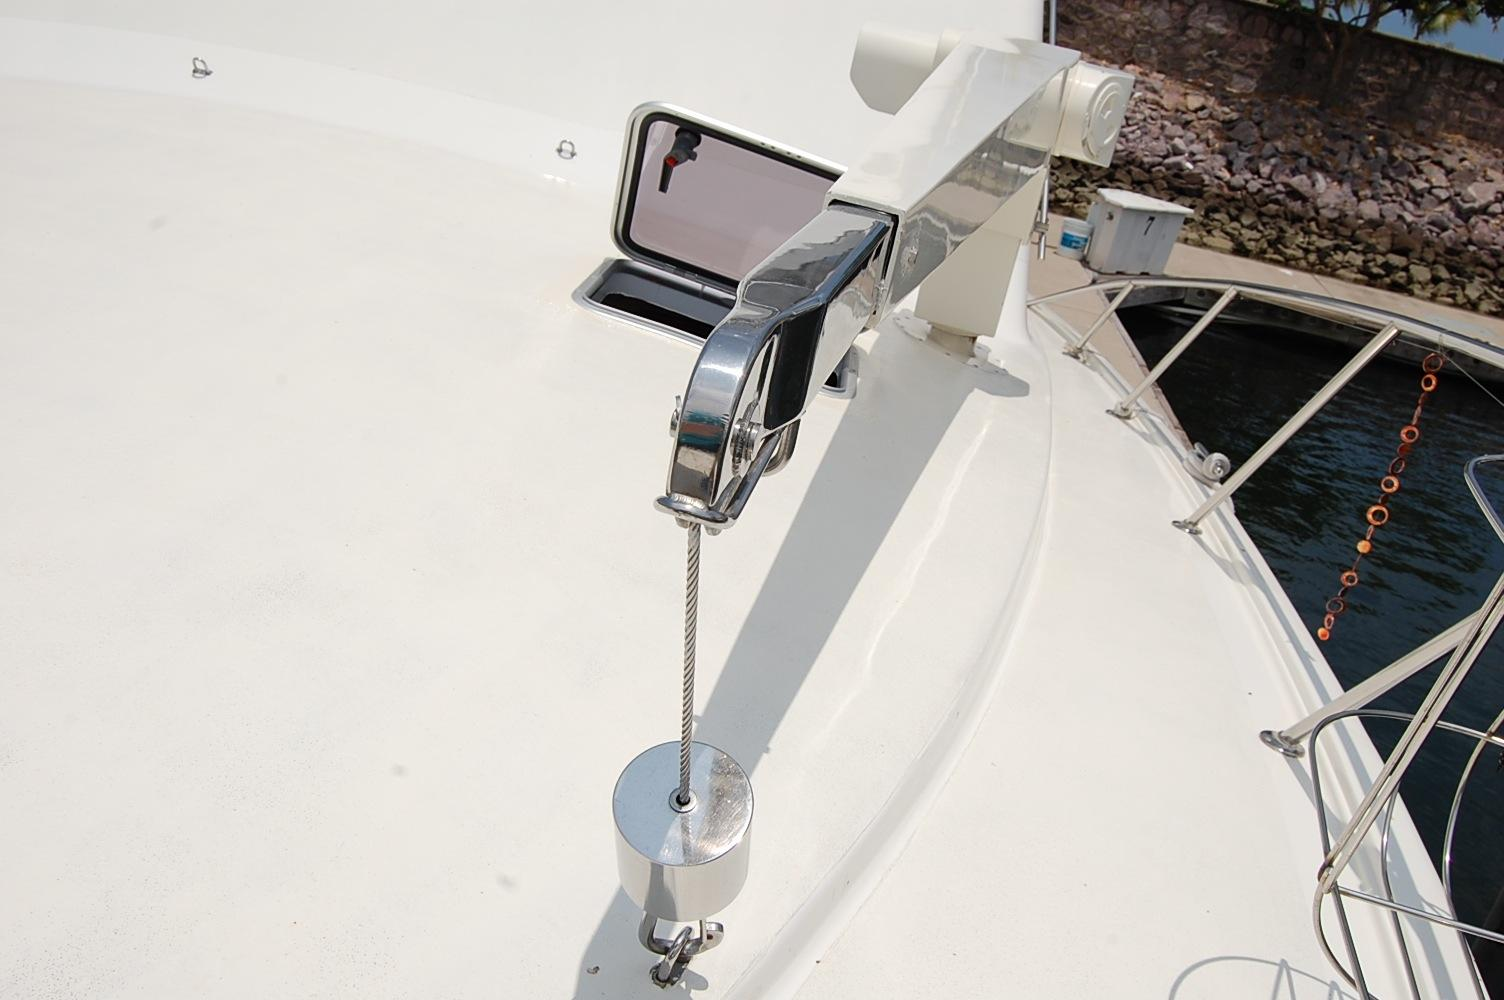 48' Ocean Yachts Super Sport+Starboard view looking Aft